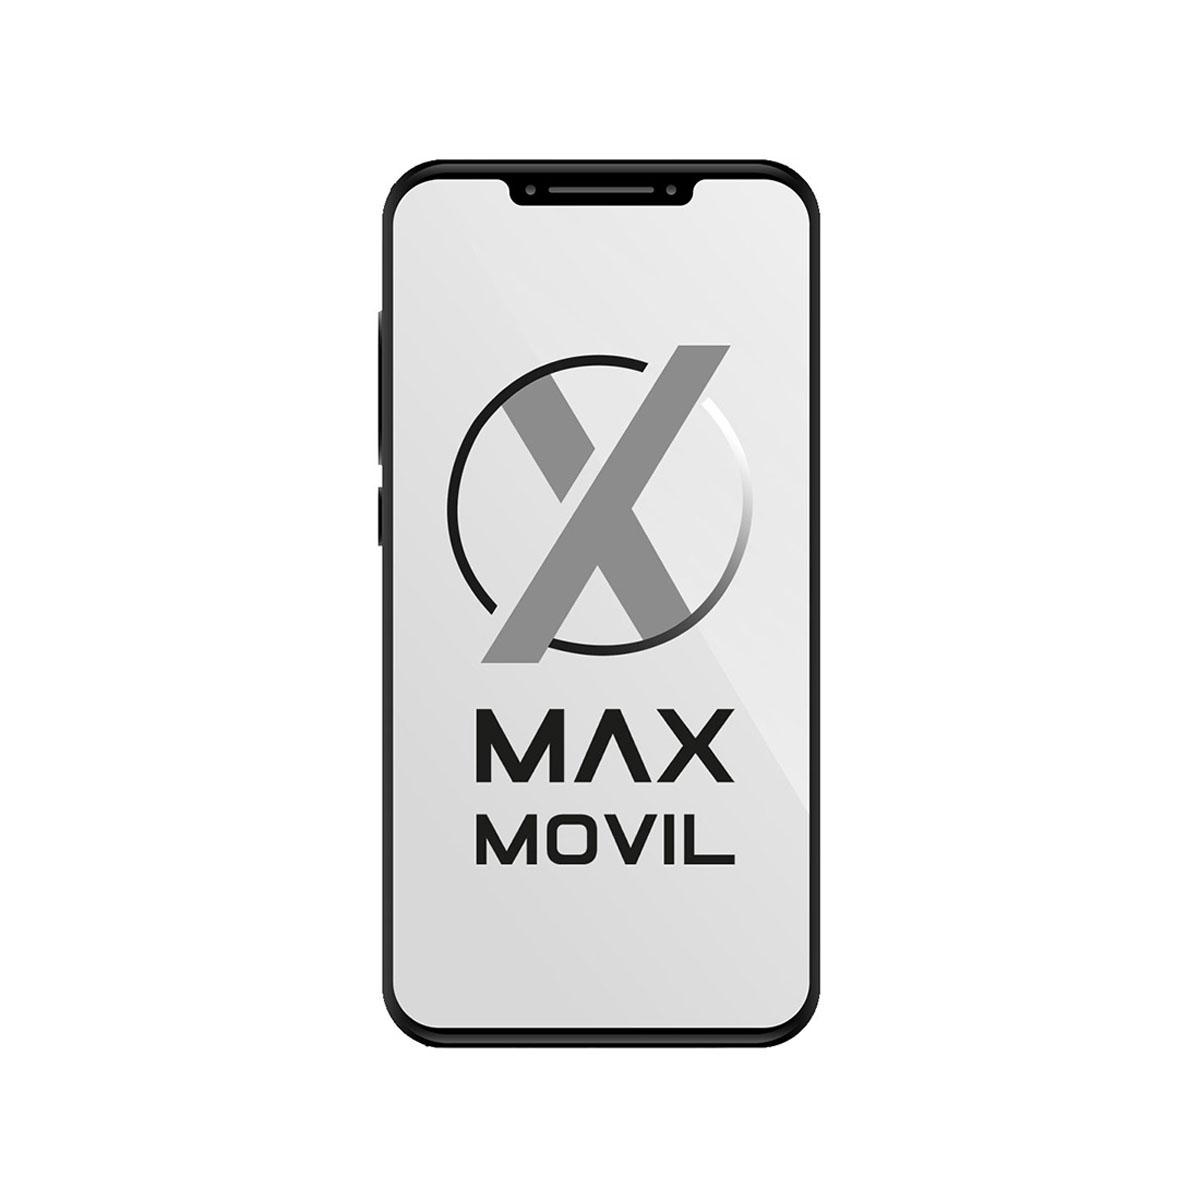 Samsung Galaxy S4 Mini i9195 LaFleur libre